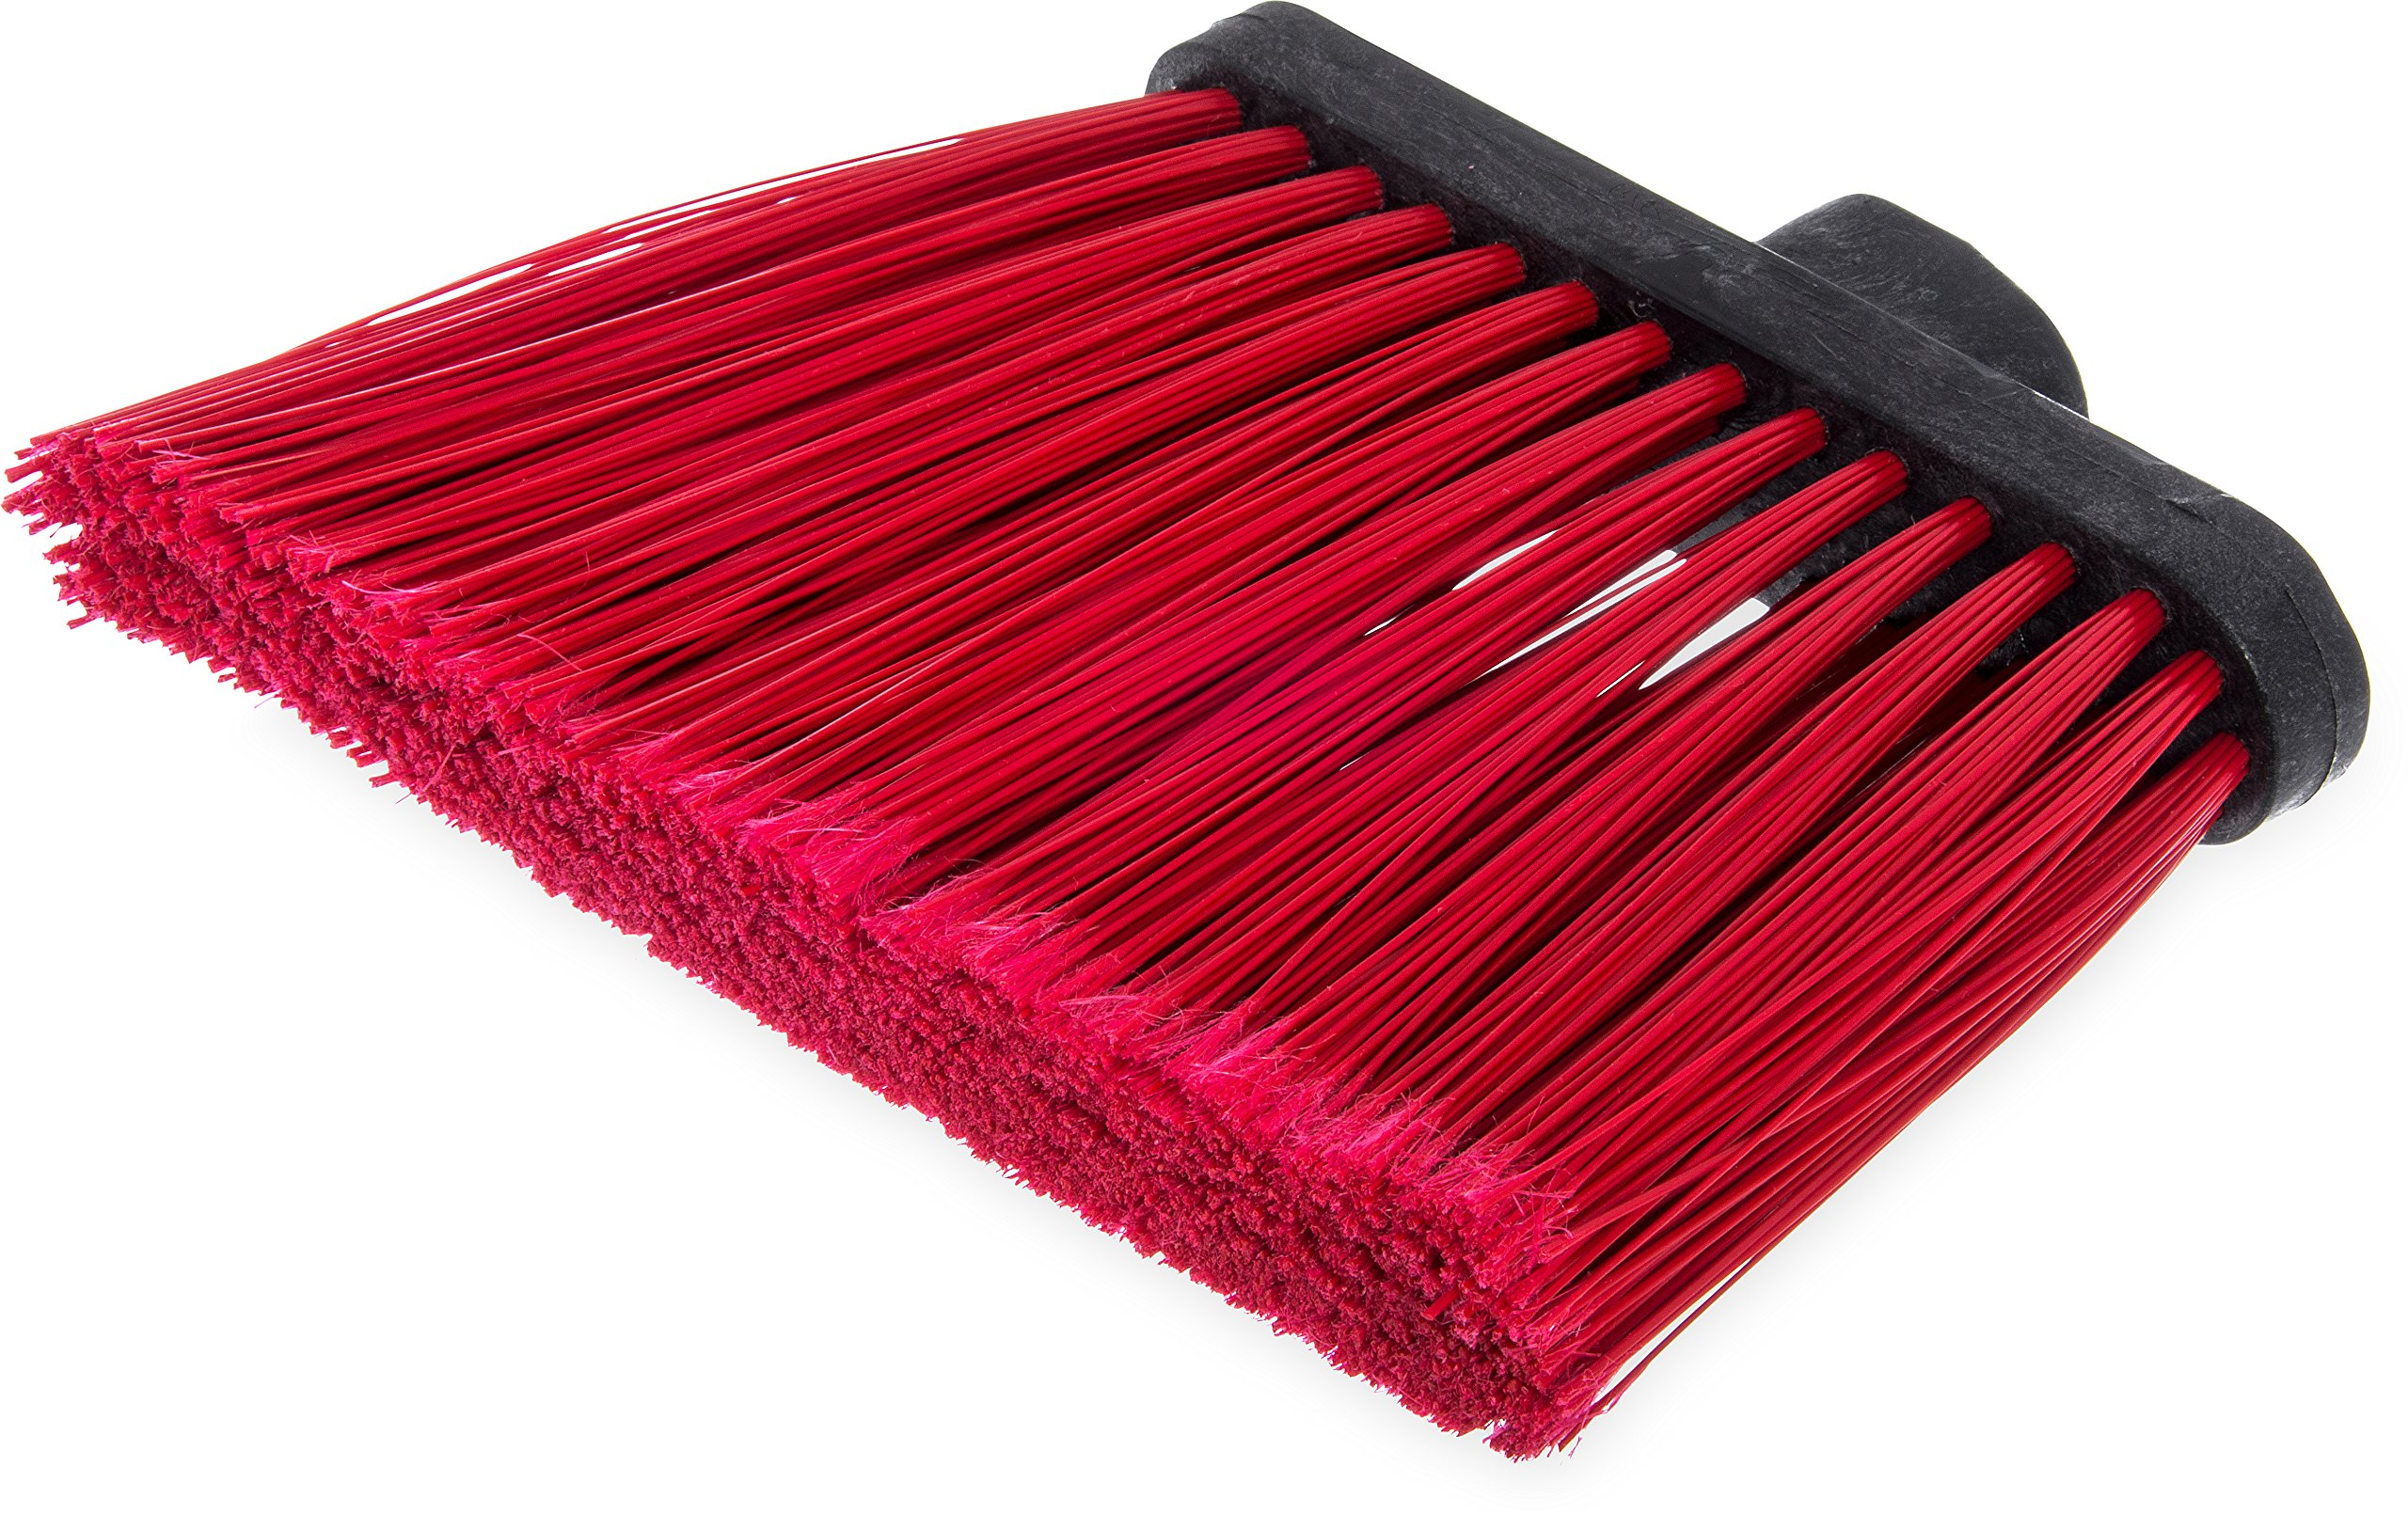 Carlisle 3686705 Duo-Sweep Medium Duty Flagged Angle Broom Head, Polypropylene Bristle, 8'' Overall Length x 12'' Width, Red (Case of 12)